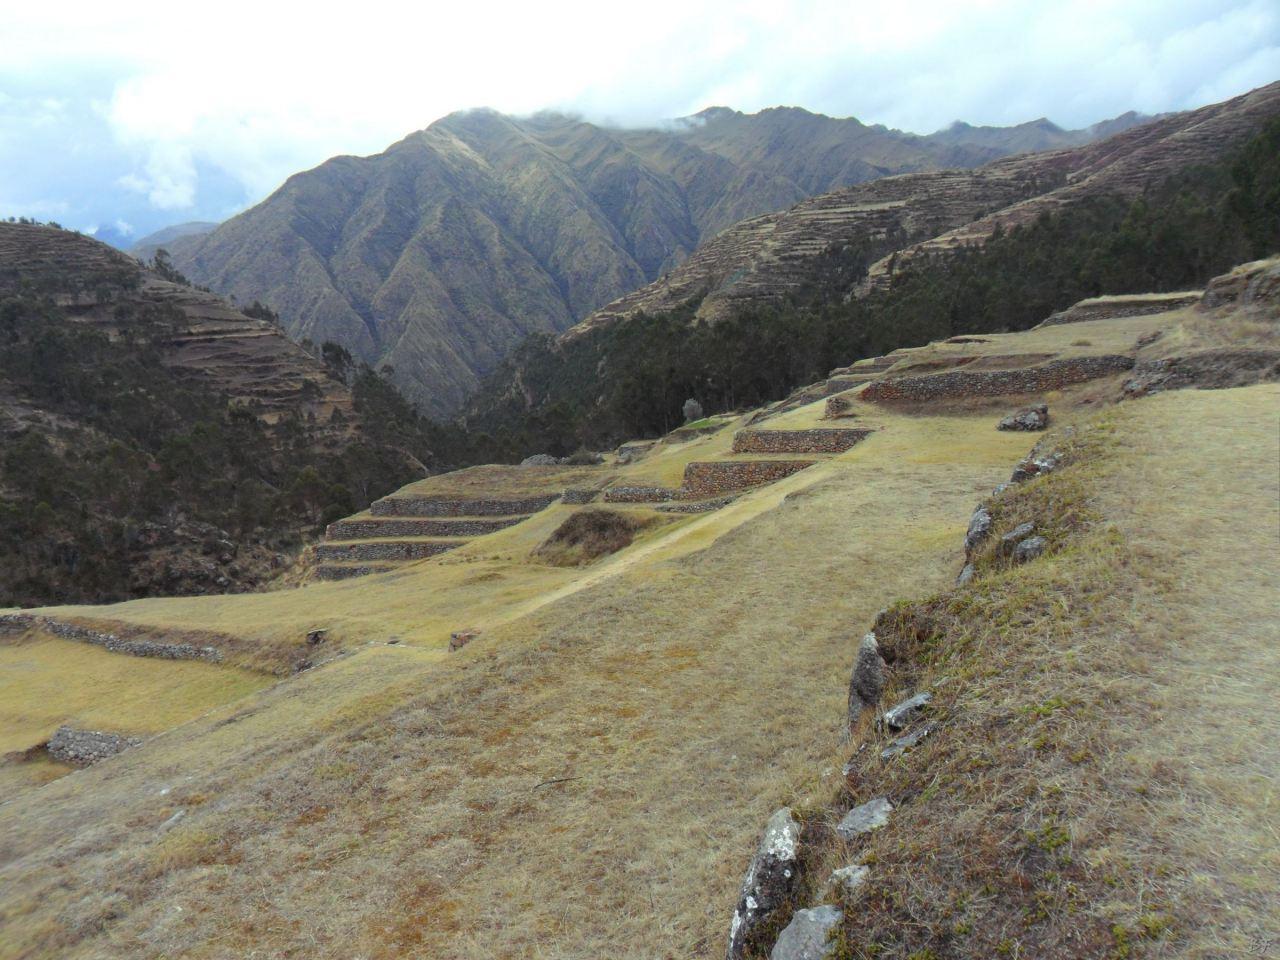 Chinchero-Mura-Poligonali-Piramide-Urubamba-Peru-54